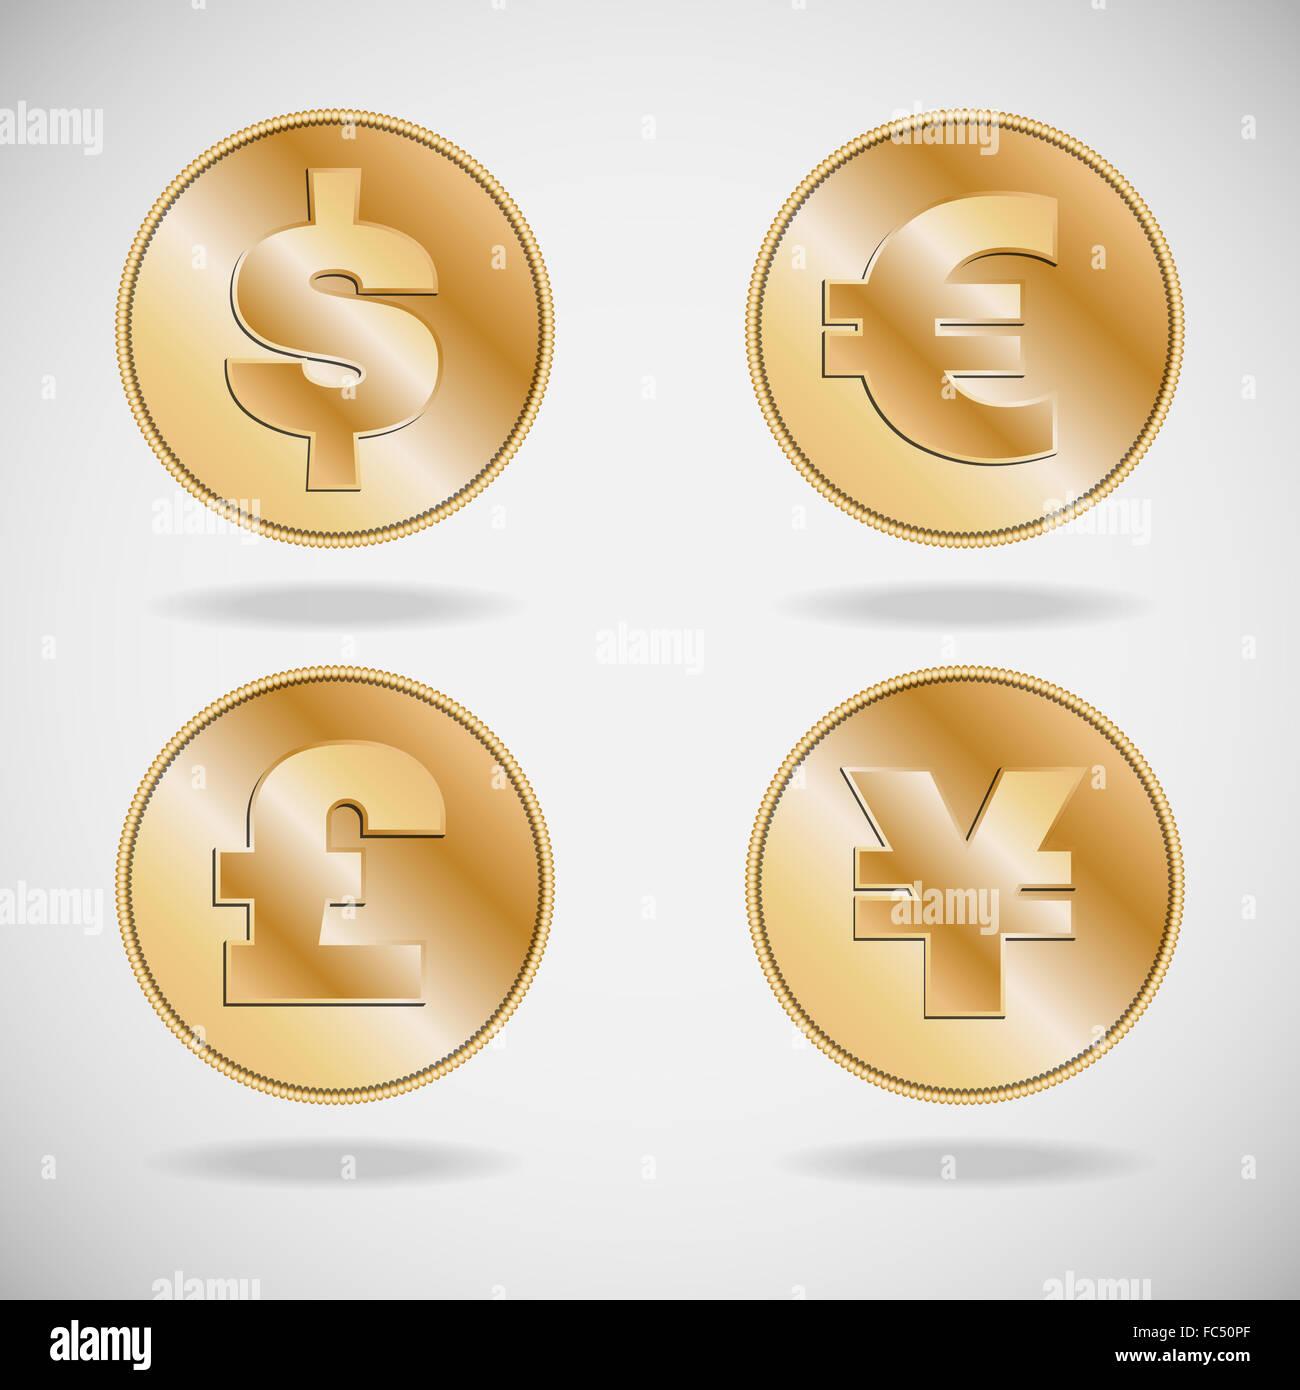 Symbols of various currencies dollar euro pound and yen or yuan symbols of various currencies dollar euro pound and yen or yuan on on gold coins buycottarizona Choice Image